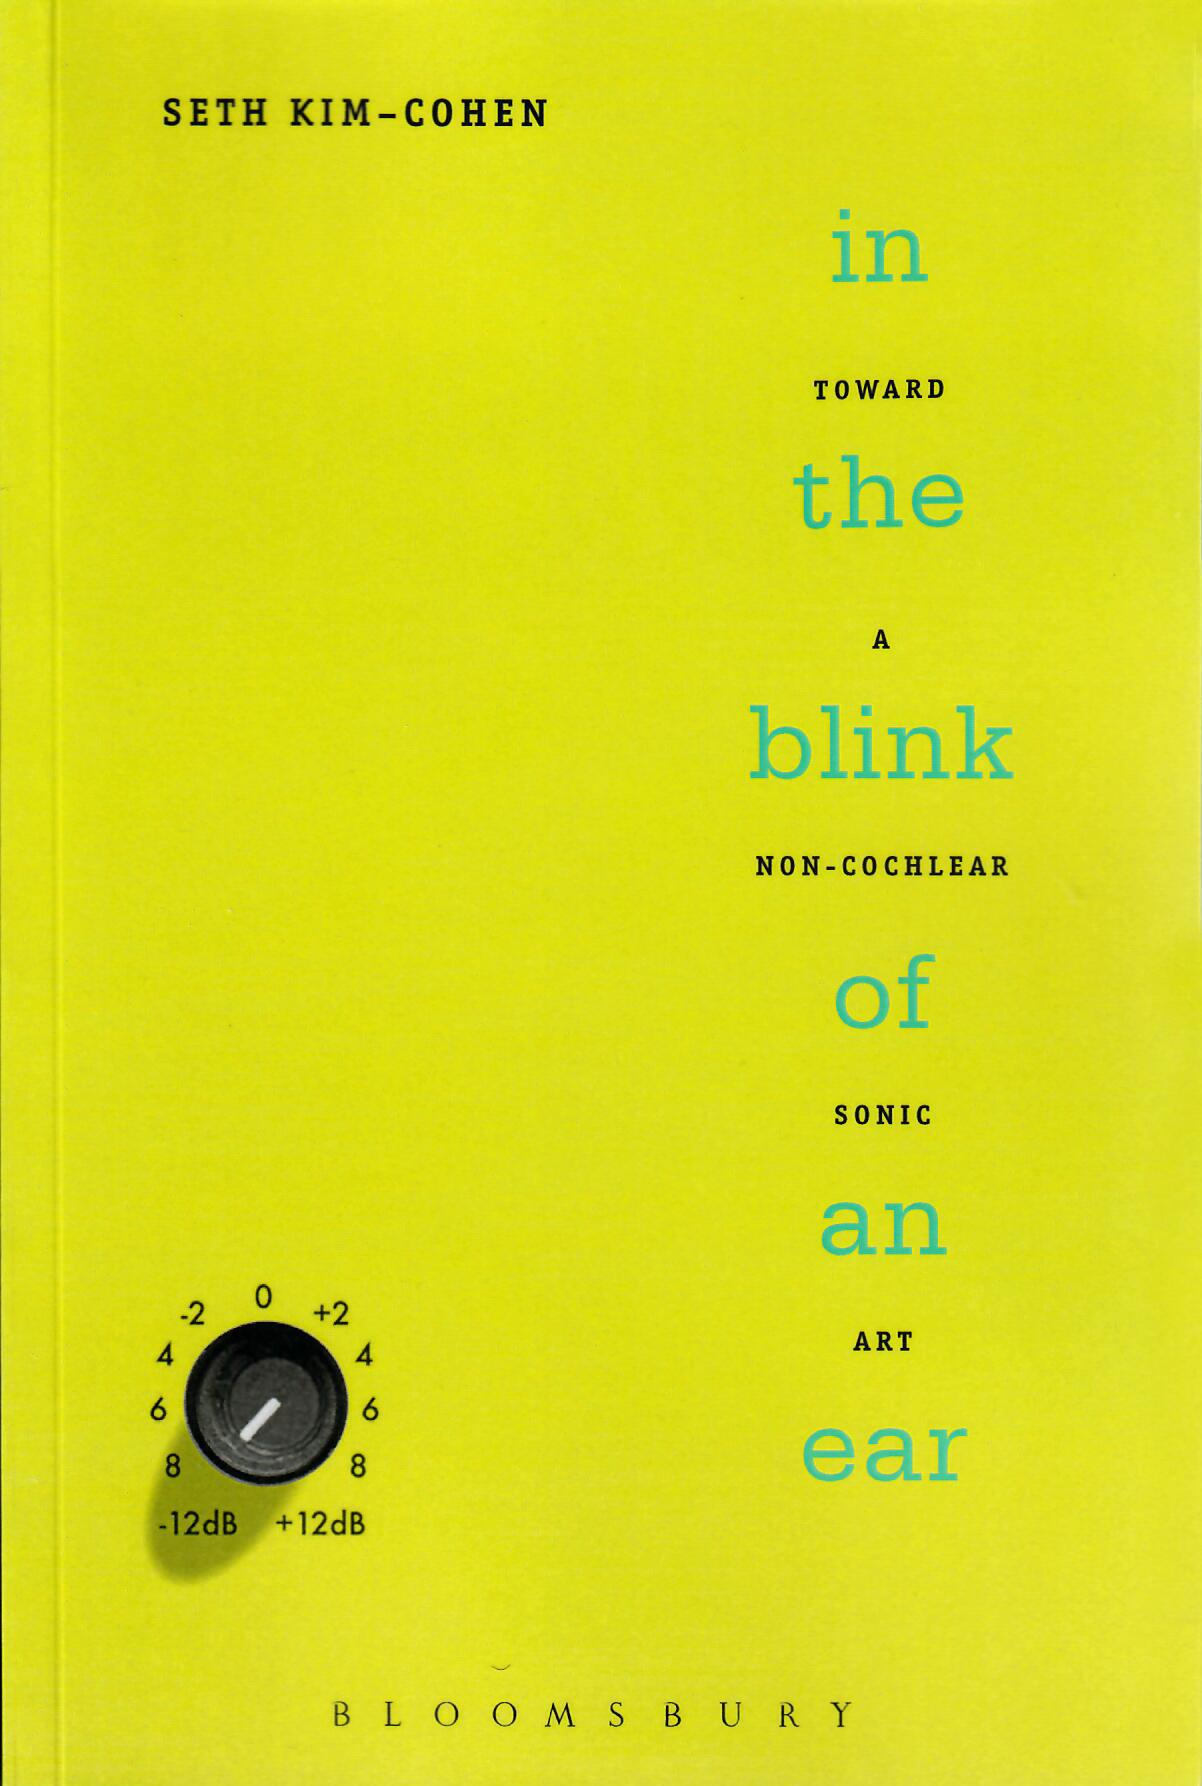 Seth Kim-Cohen. In the Blink of an Ear: Toward a Non-Cochlear Sound Art, Continuum, 2009